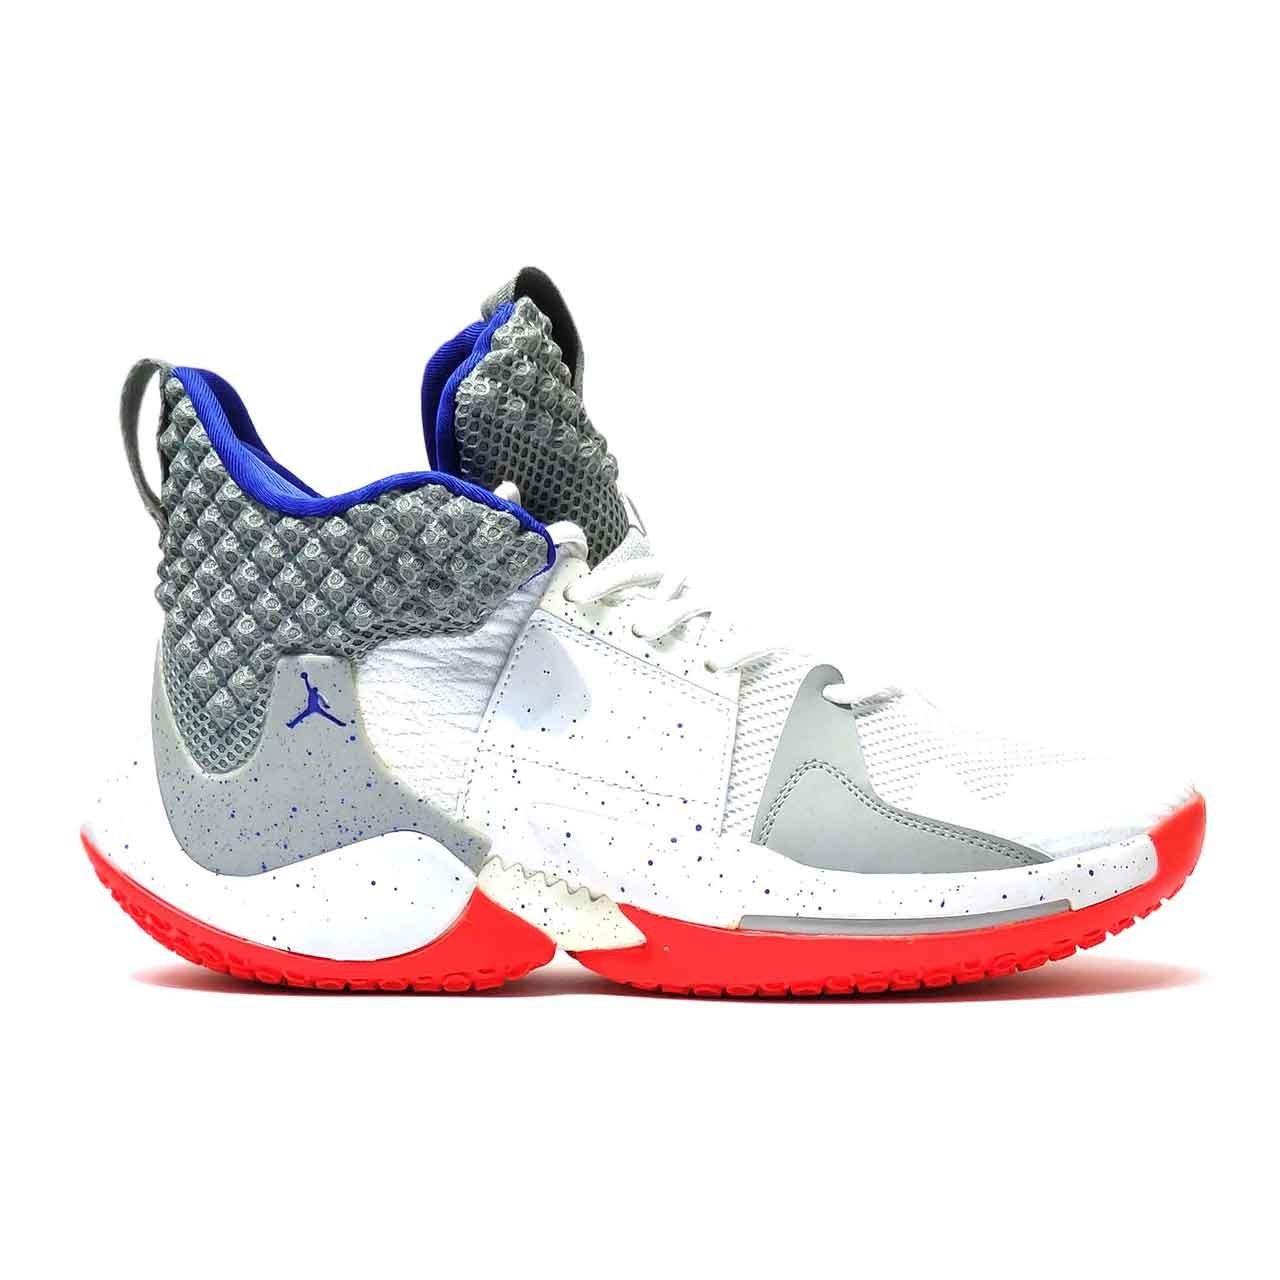 تصویر کفش بسکتبال نایک مدل JORDAN WHY NOT ZER0.2